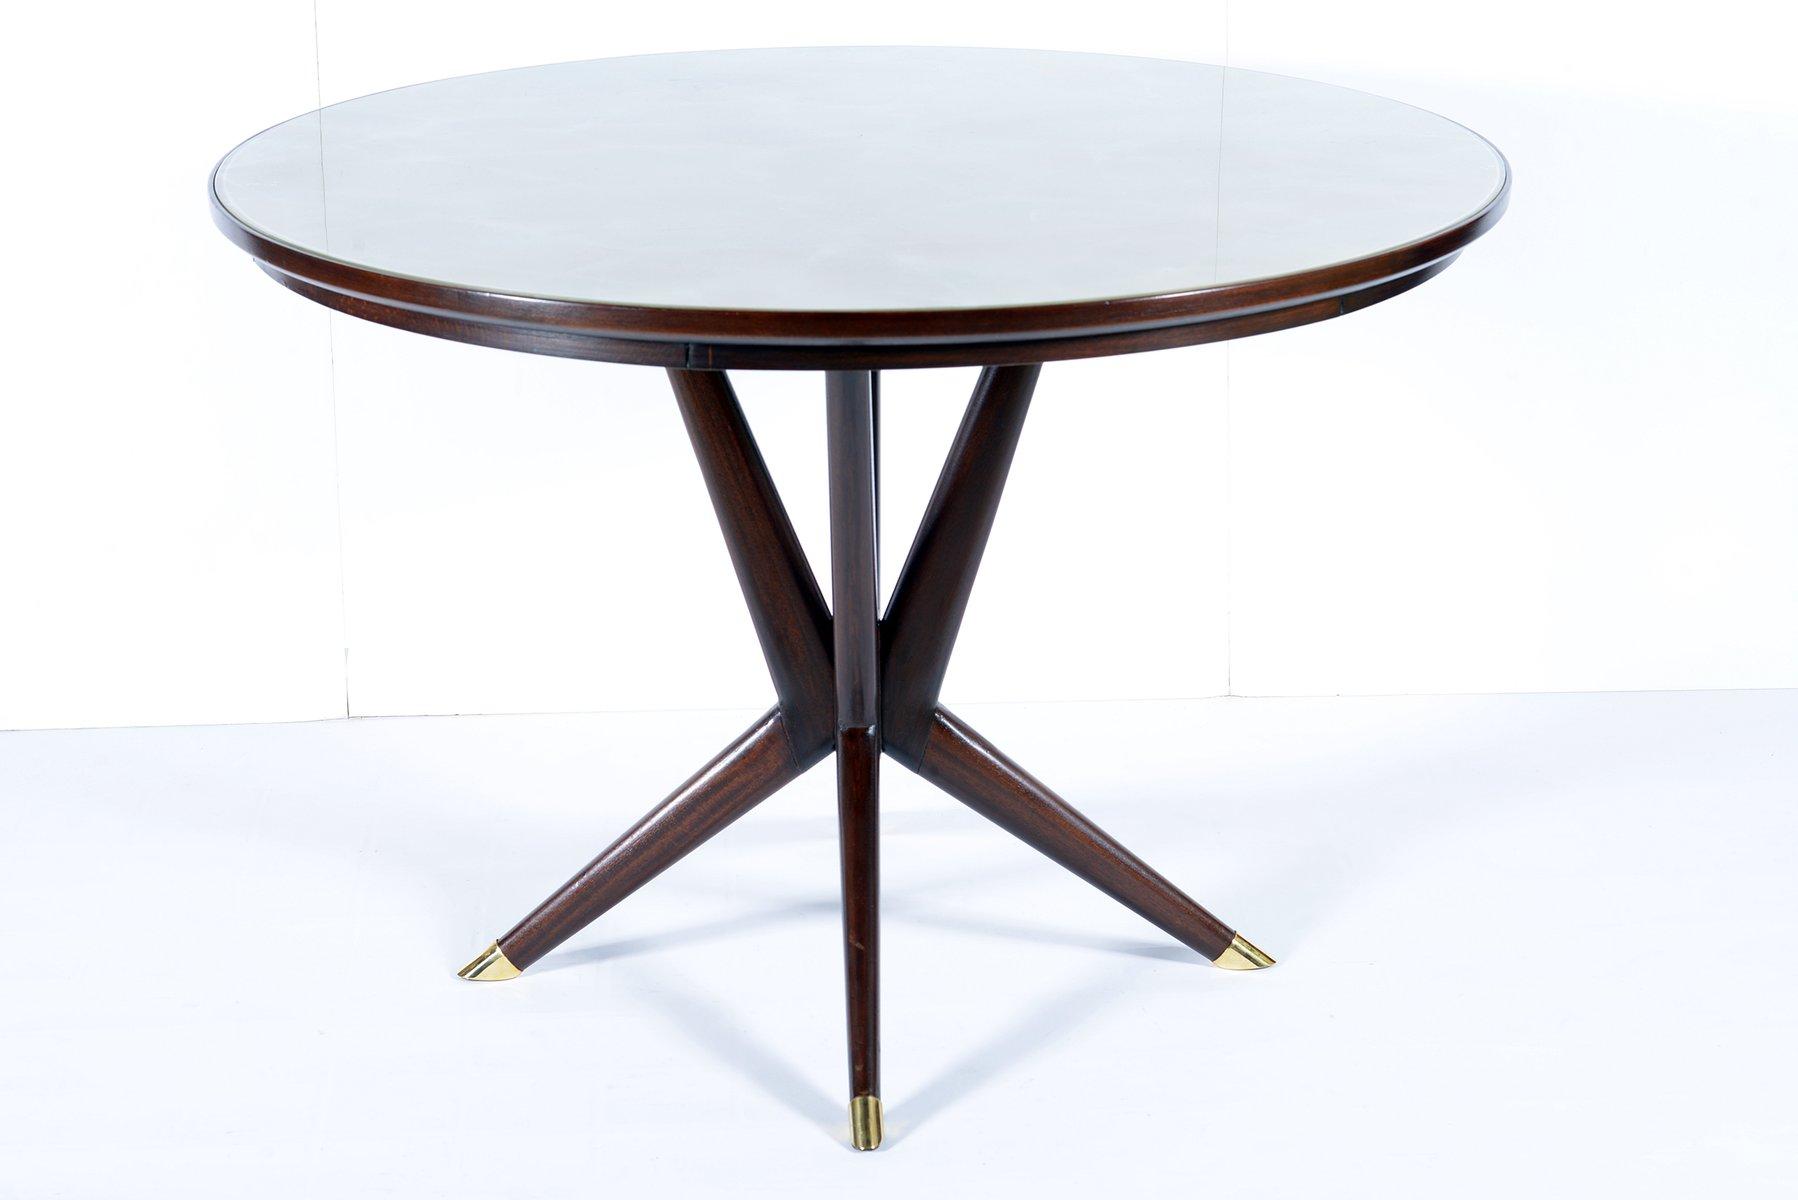 table ronde avec plateau en verre italie 1950s en vente. Black Bedroom Furniture Sets. Home Design Ideas